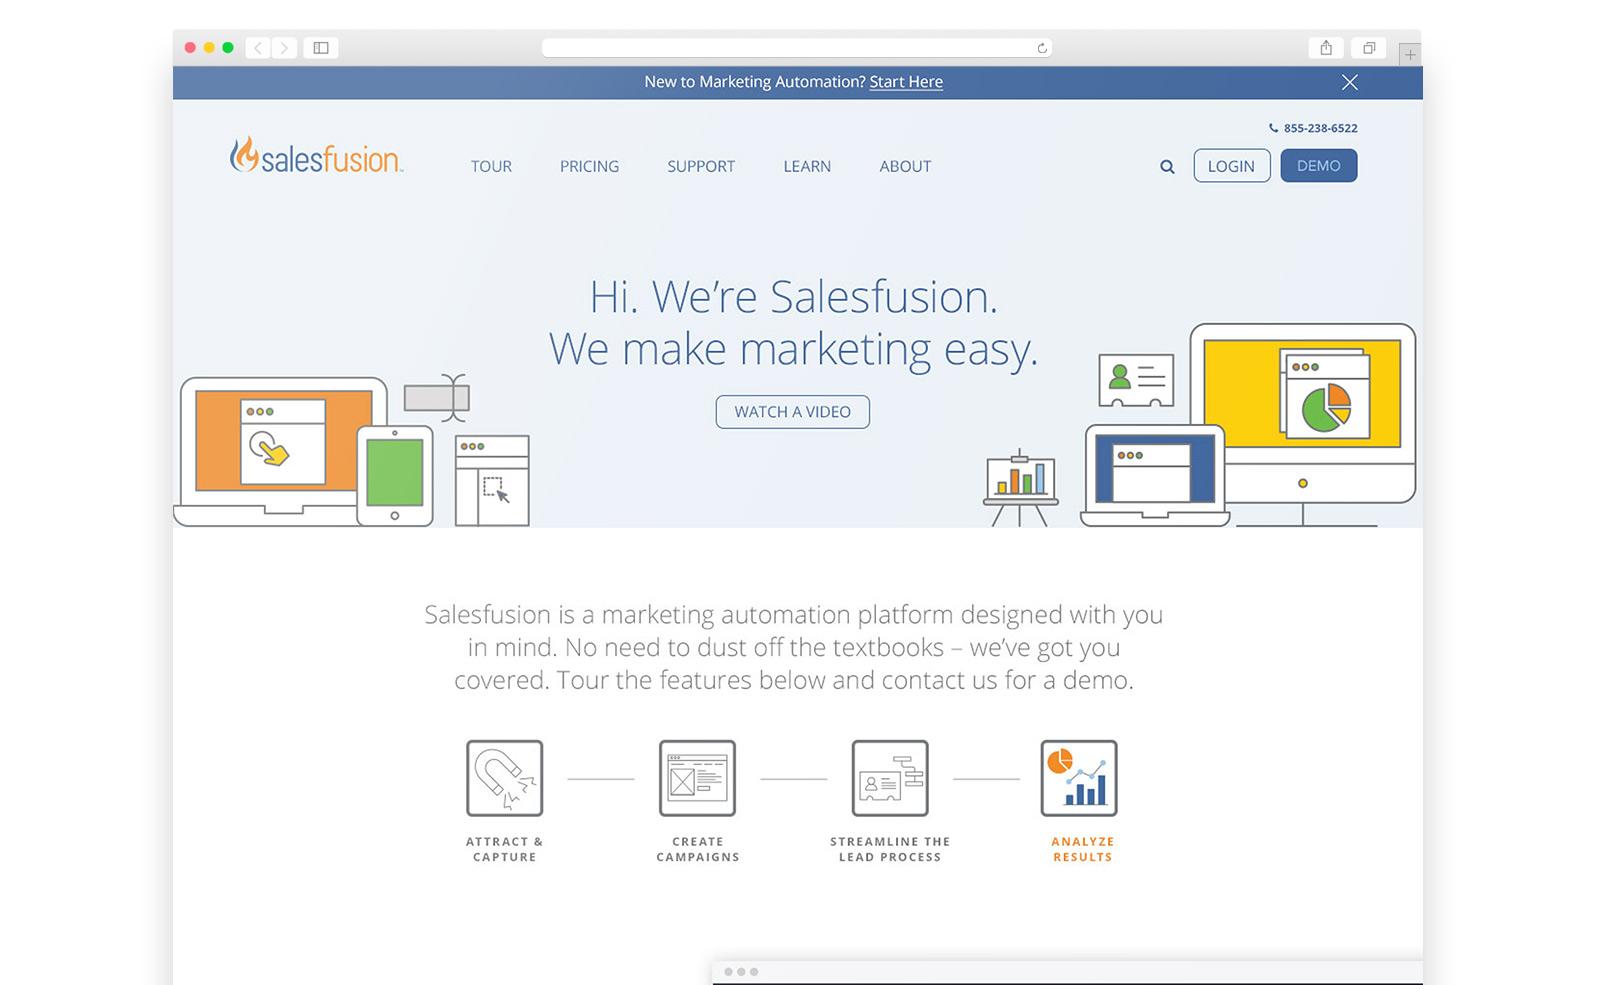 Salesfusion website